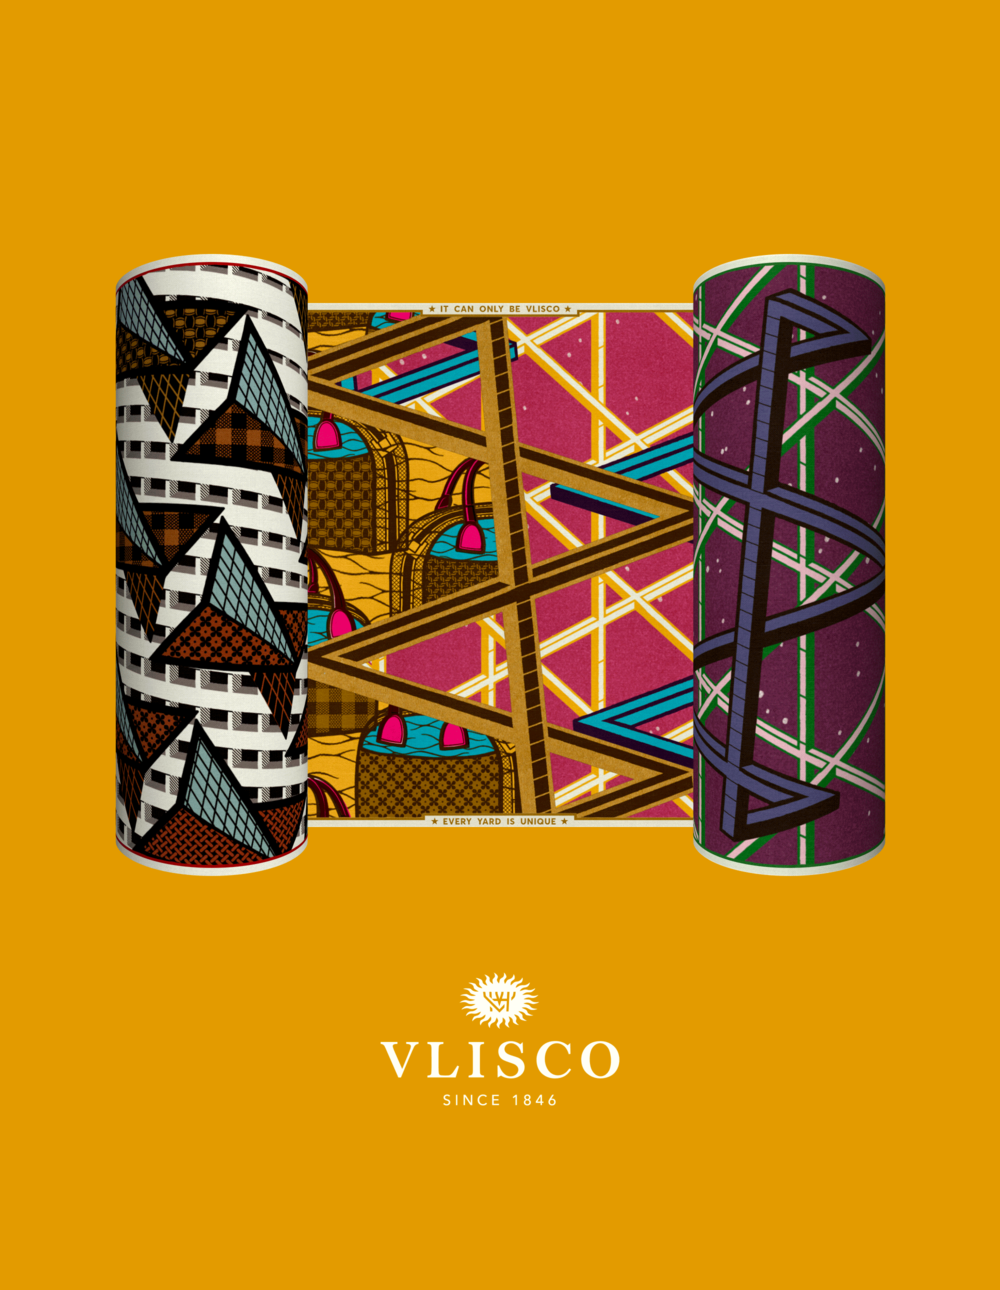 VLISCO_PRINT_00017.png